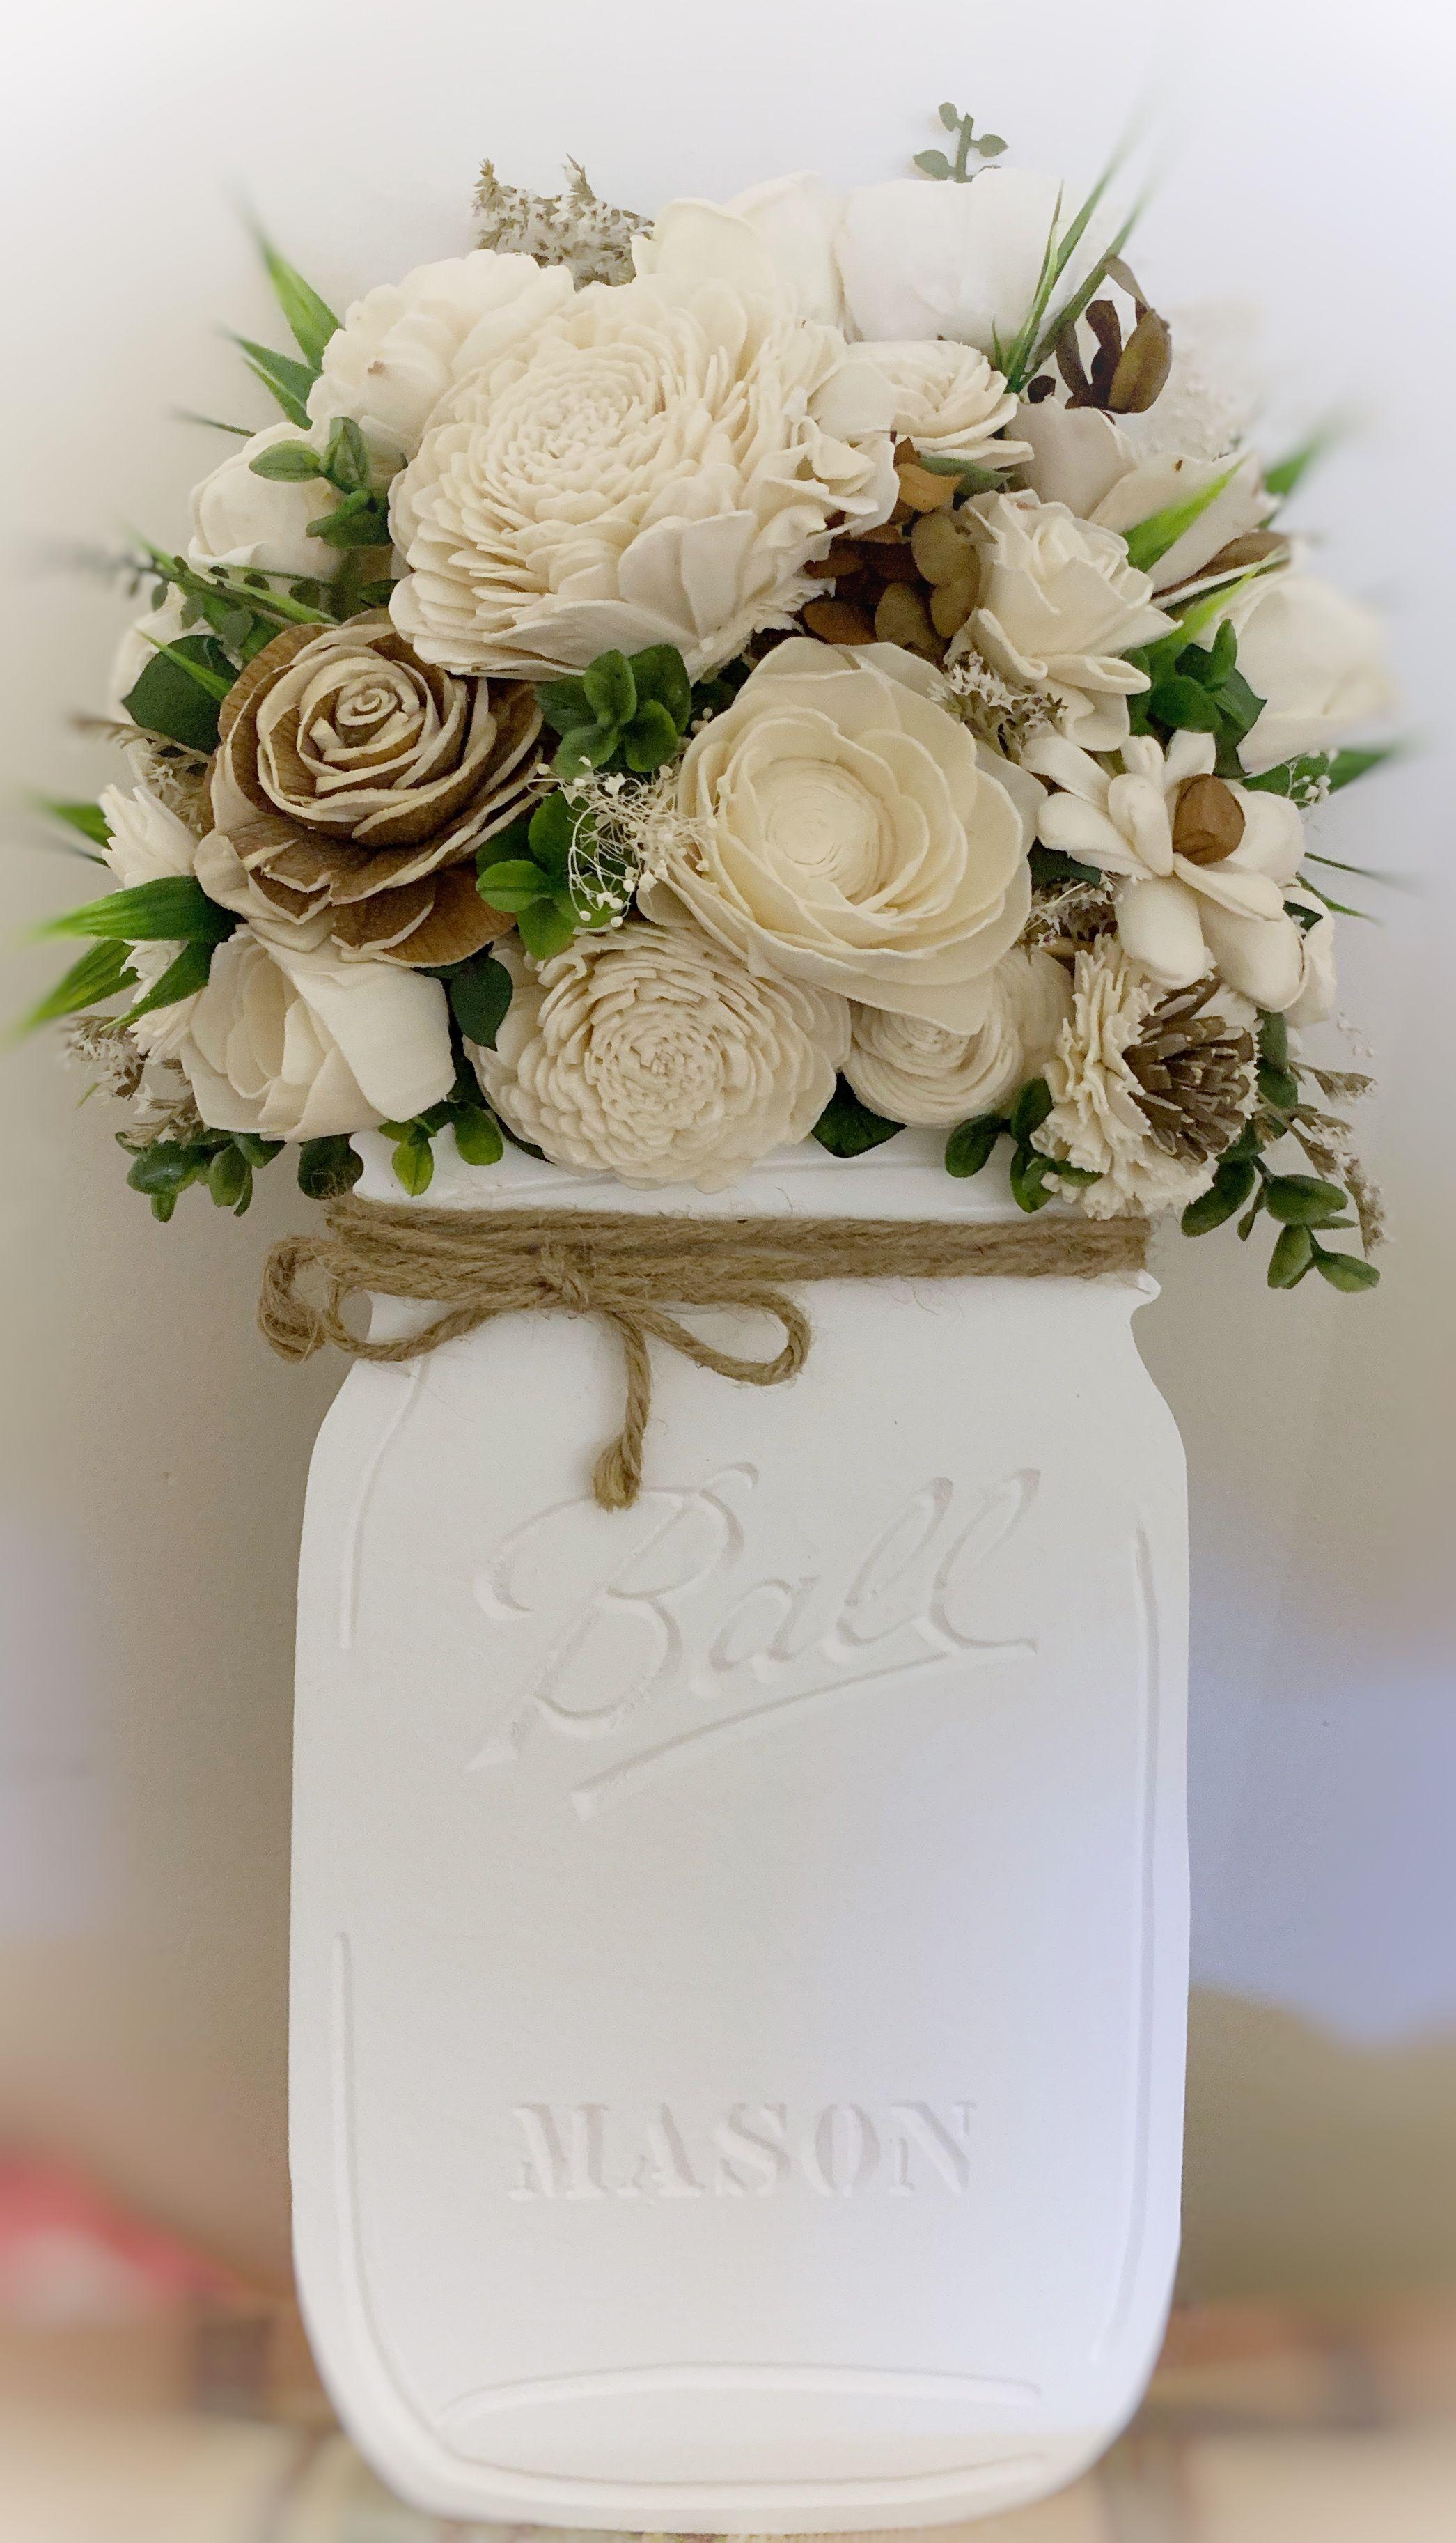 Sola Wood Flower Bouquet In Mason Jar Sola Wood Flowers Sola